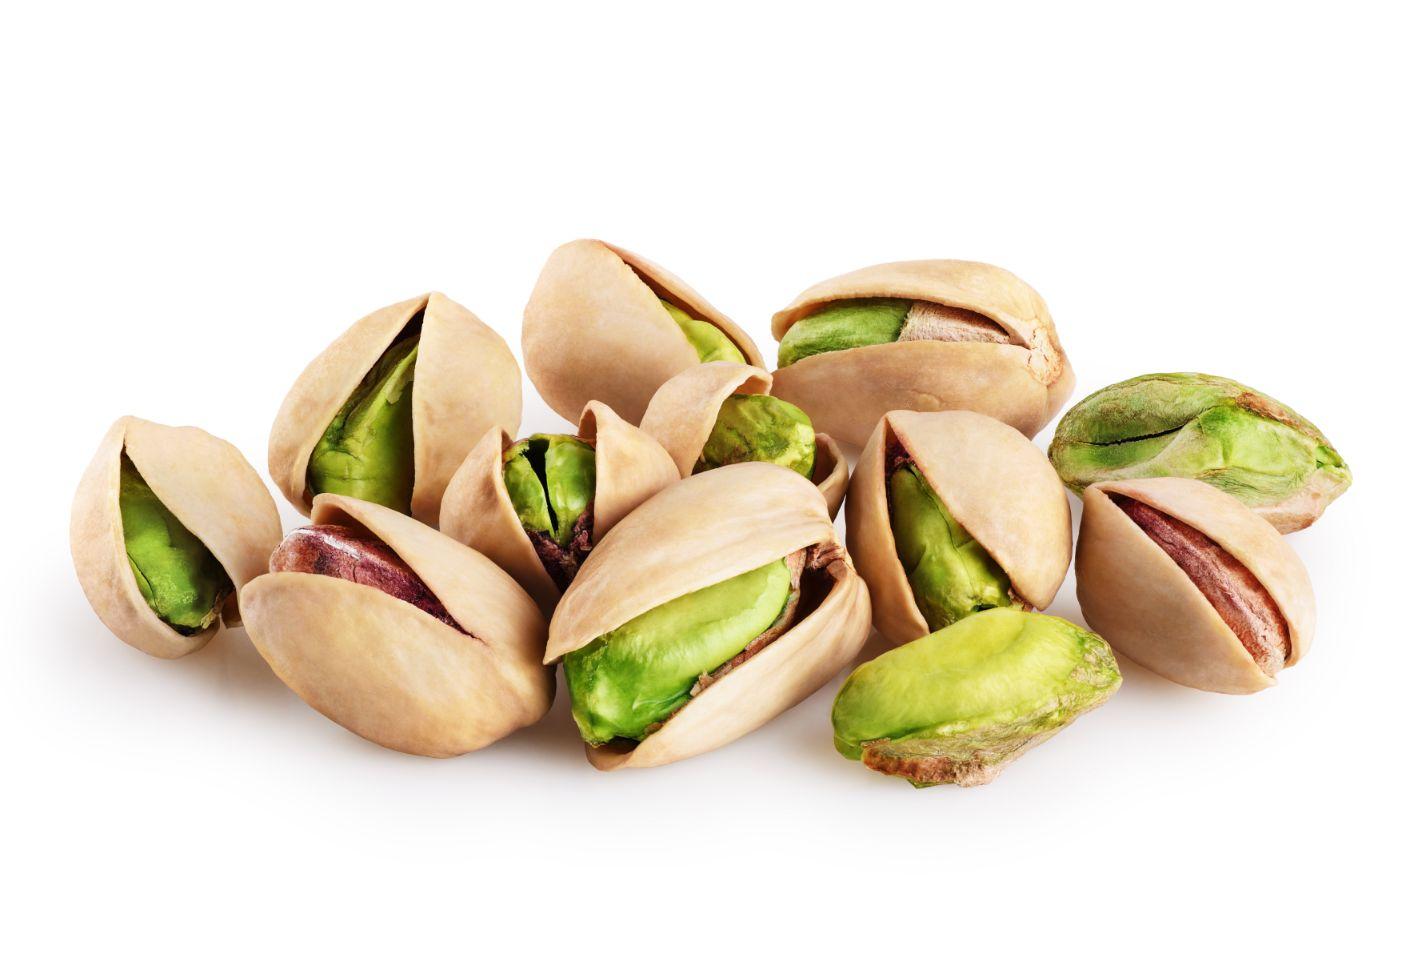 Aphrodisiac Food PISTACHIO NUTS